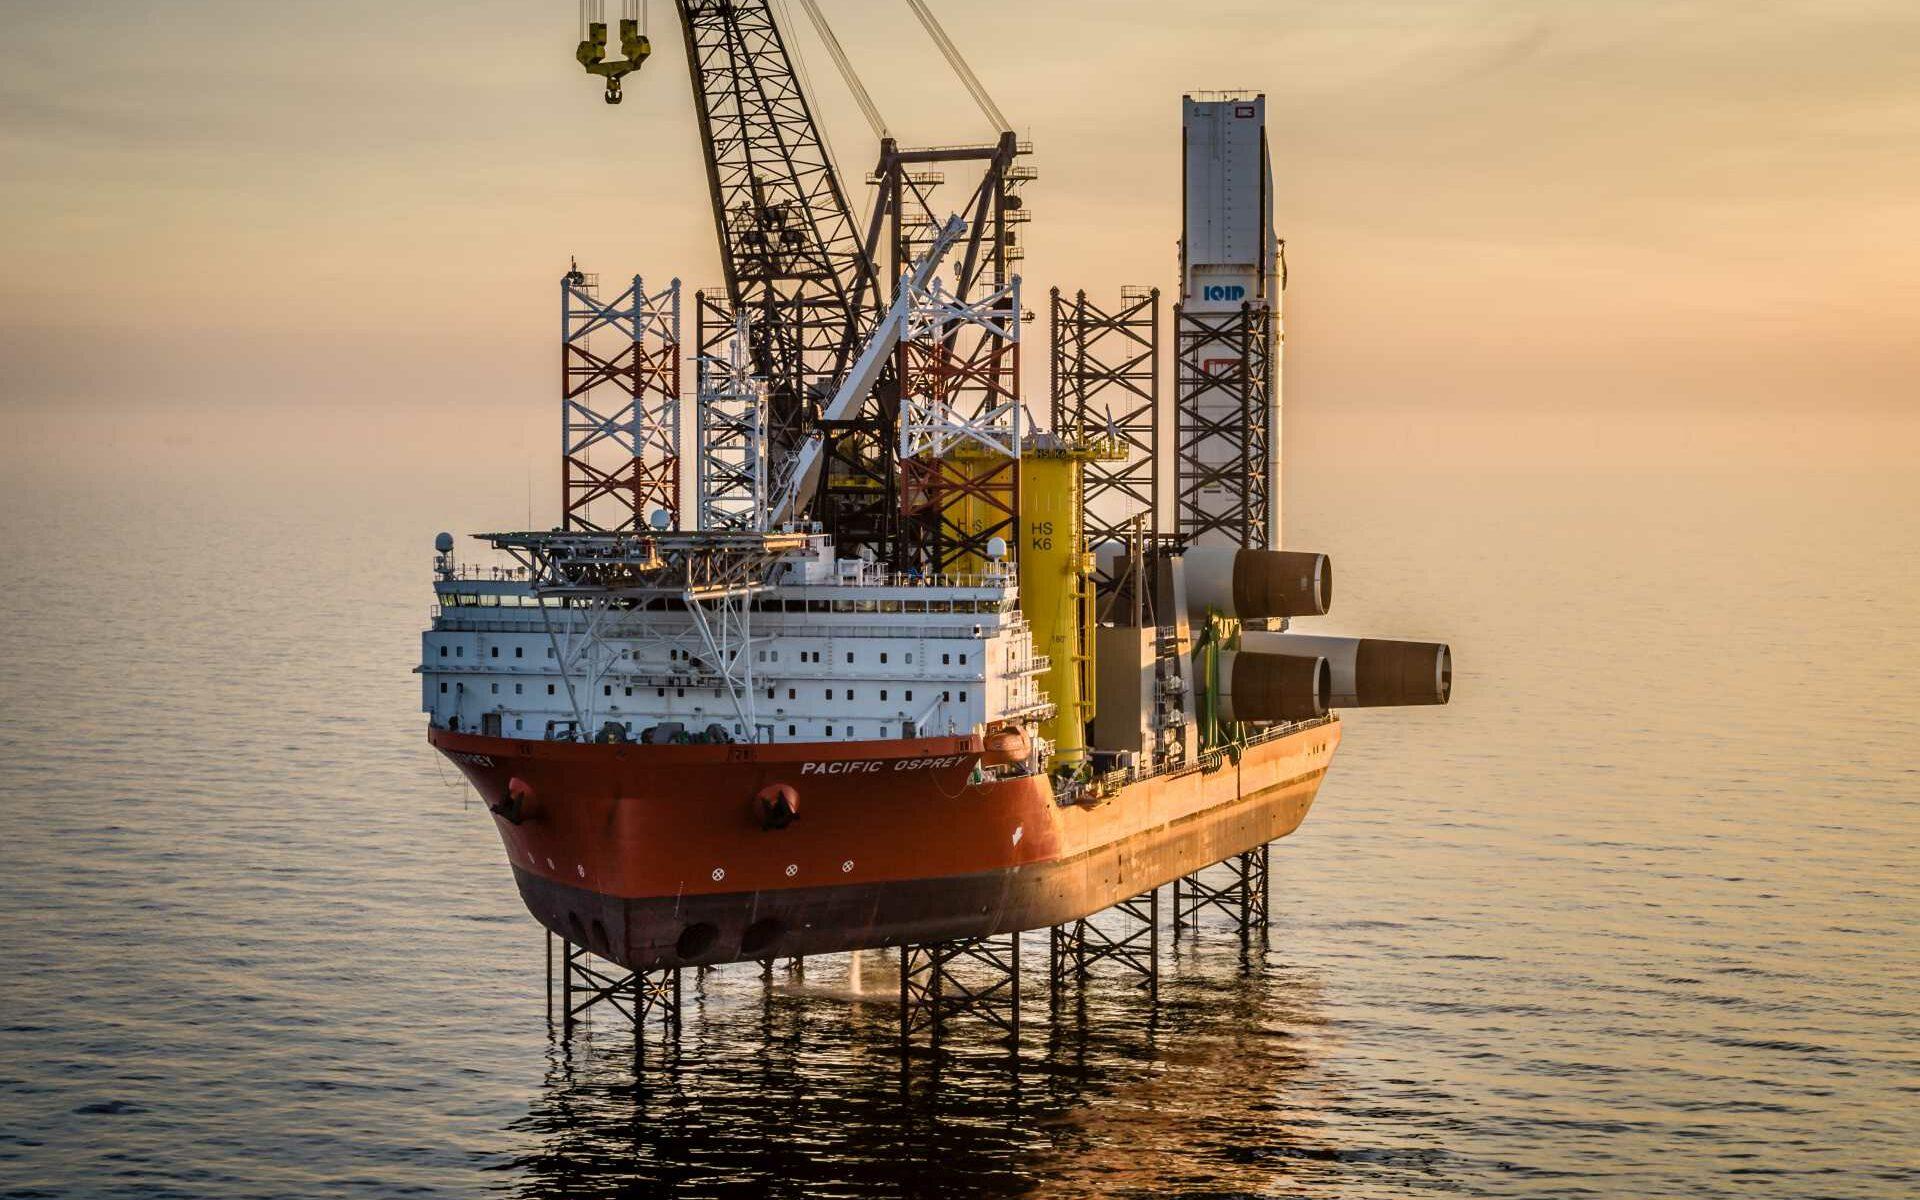 Wind Turbine Installation Vessel JACK Charter Purchase Brokerage Services GRS